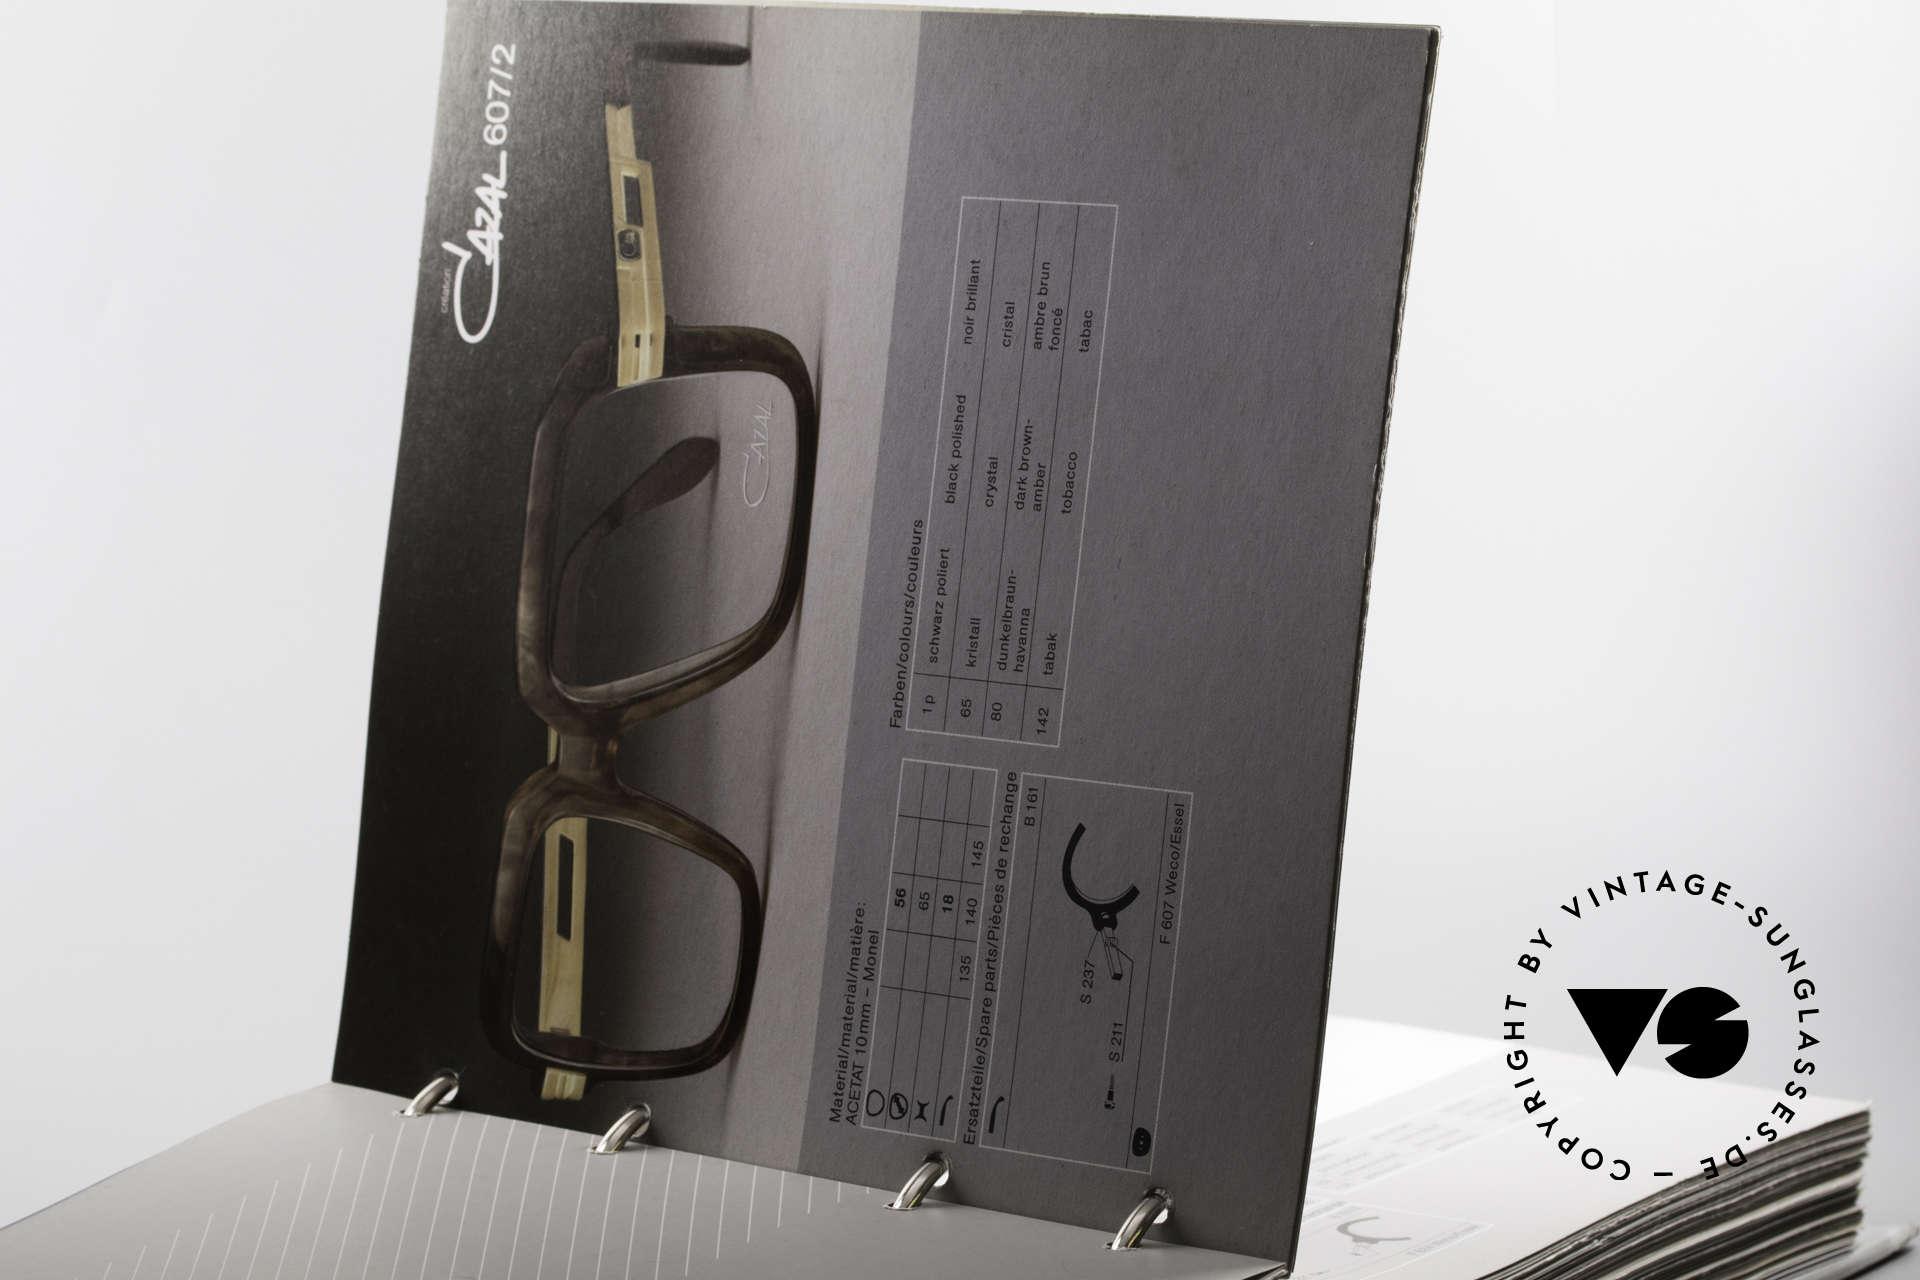 Cazal 0 Catalog Old 80's 90's Cazal Catalogue, Size: extra large, Made for Men and Women